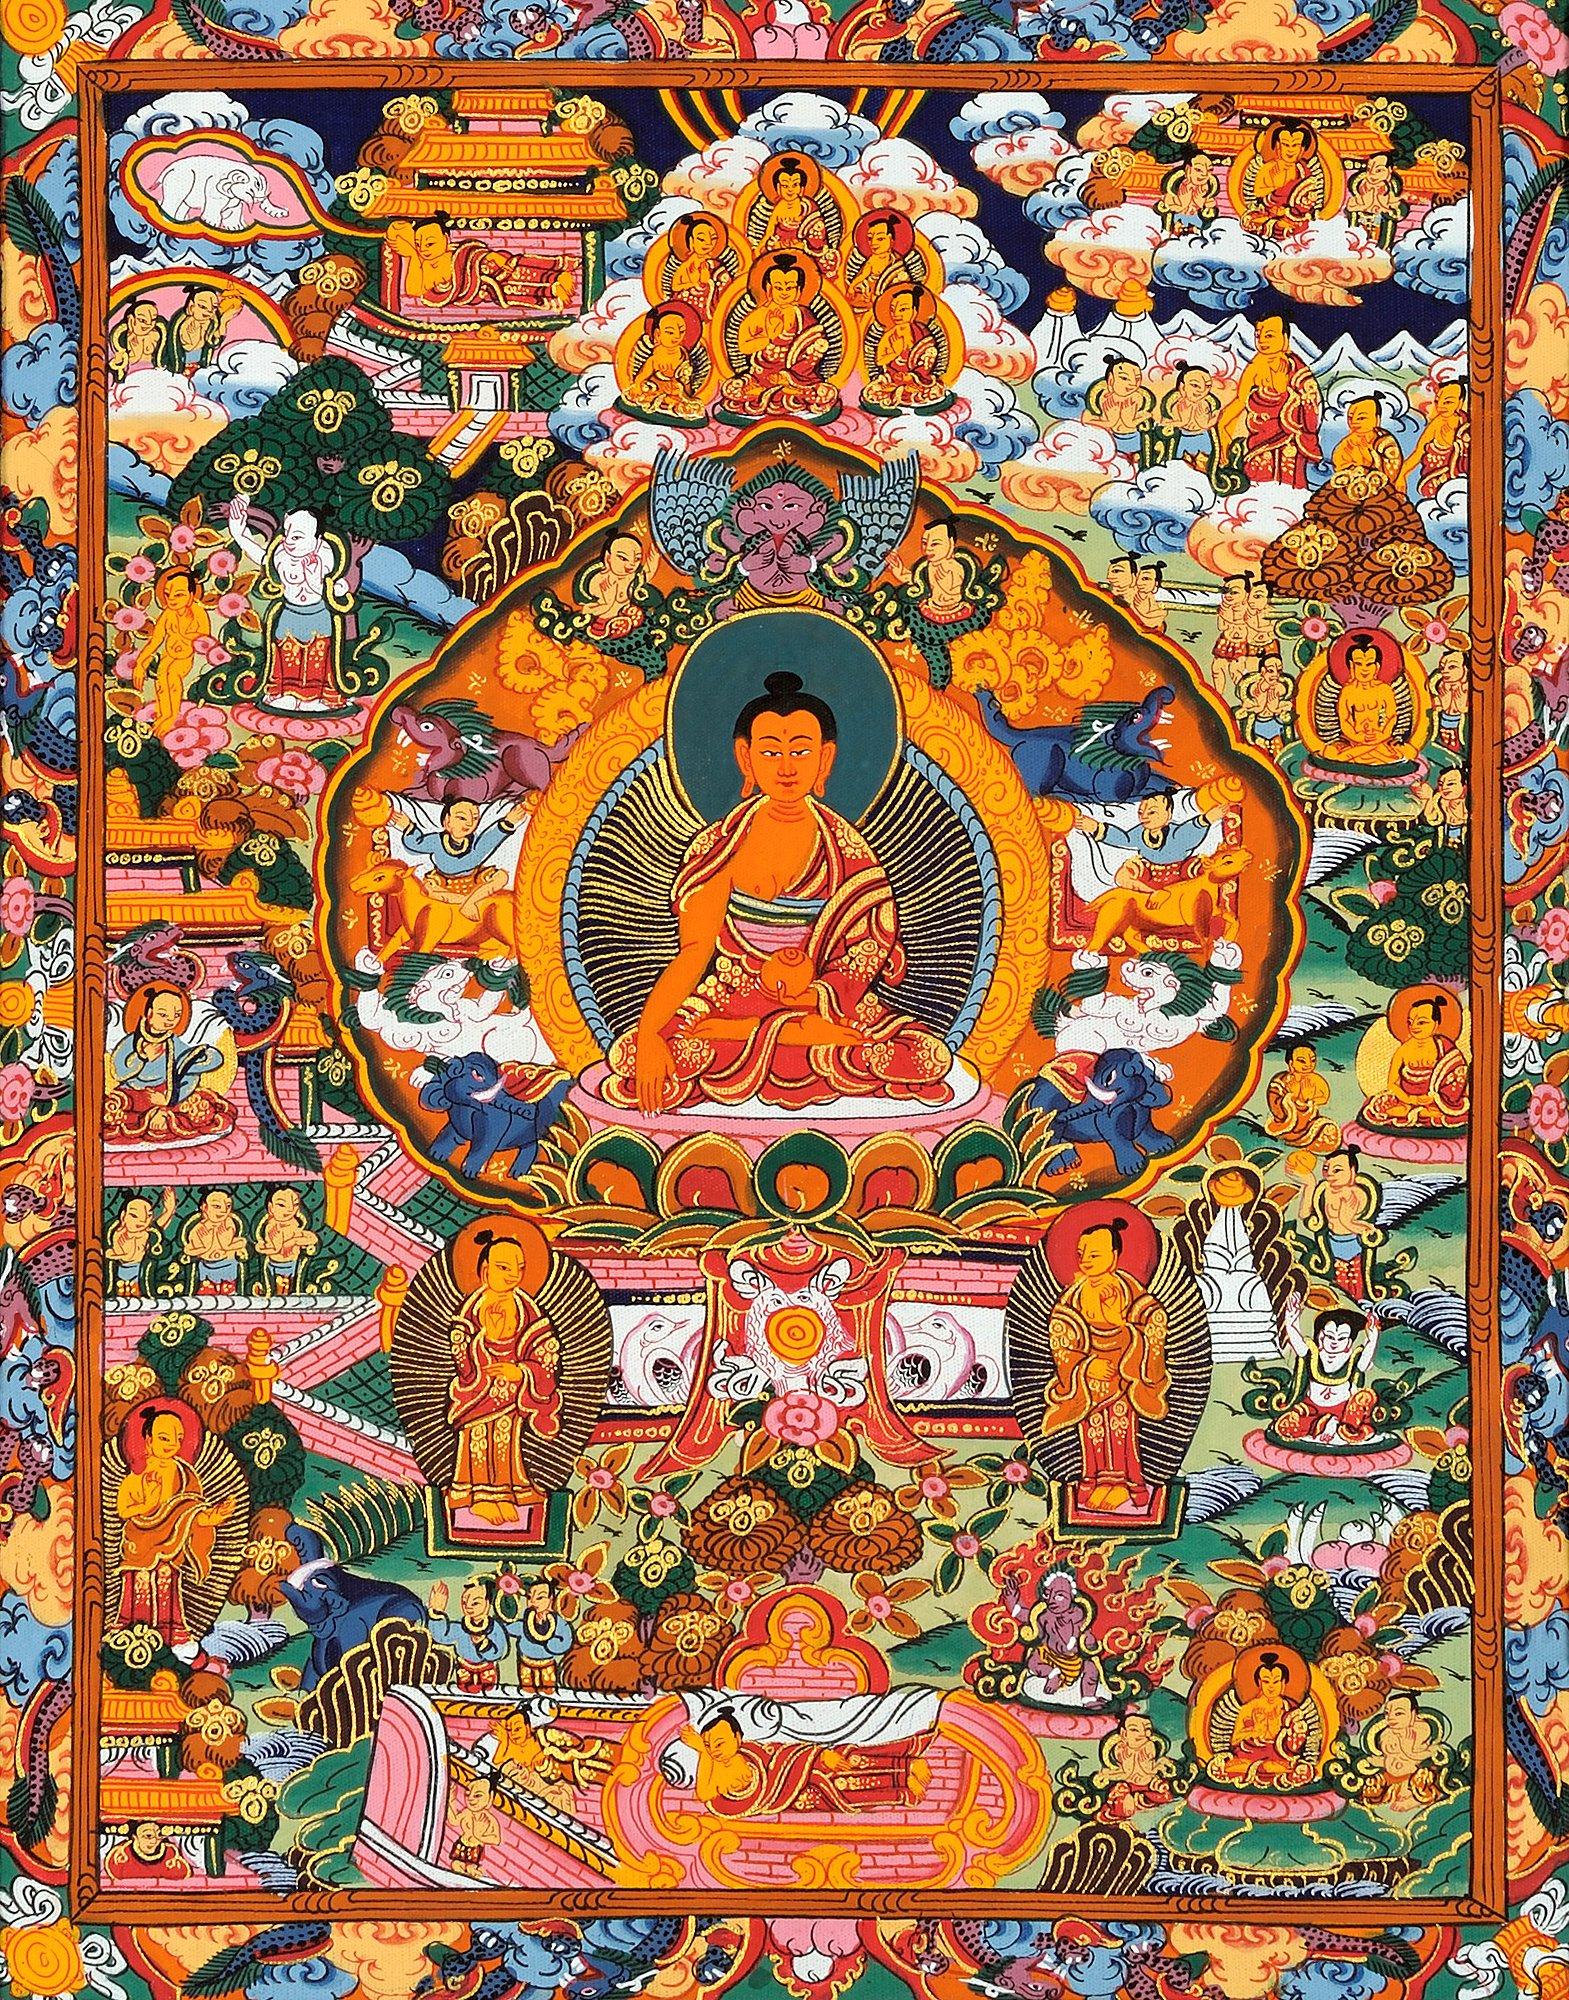 Gautam Buddha with Scenes from His Life (Tibetan Buddhist) - Tibetan Thangka Painting by Exotic India (Image #1)